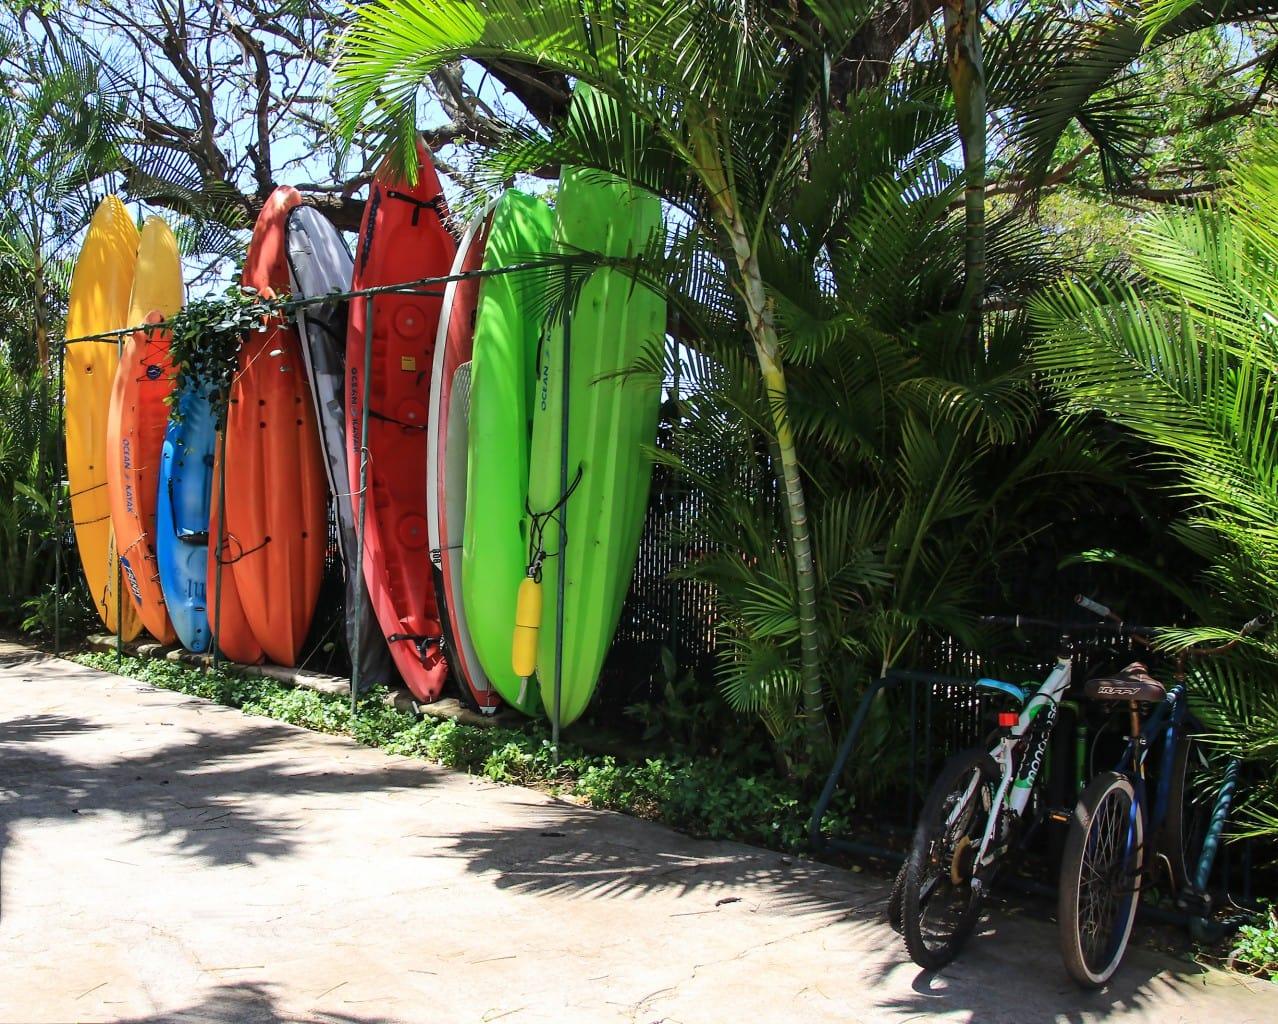 Surf and Bike by Sandra Greenberg bike near surf boards